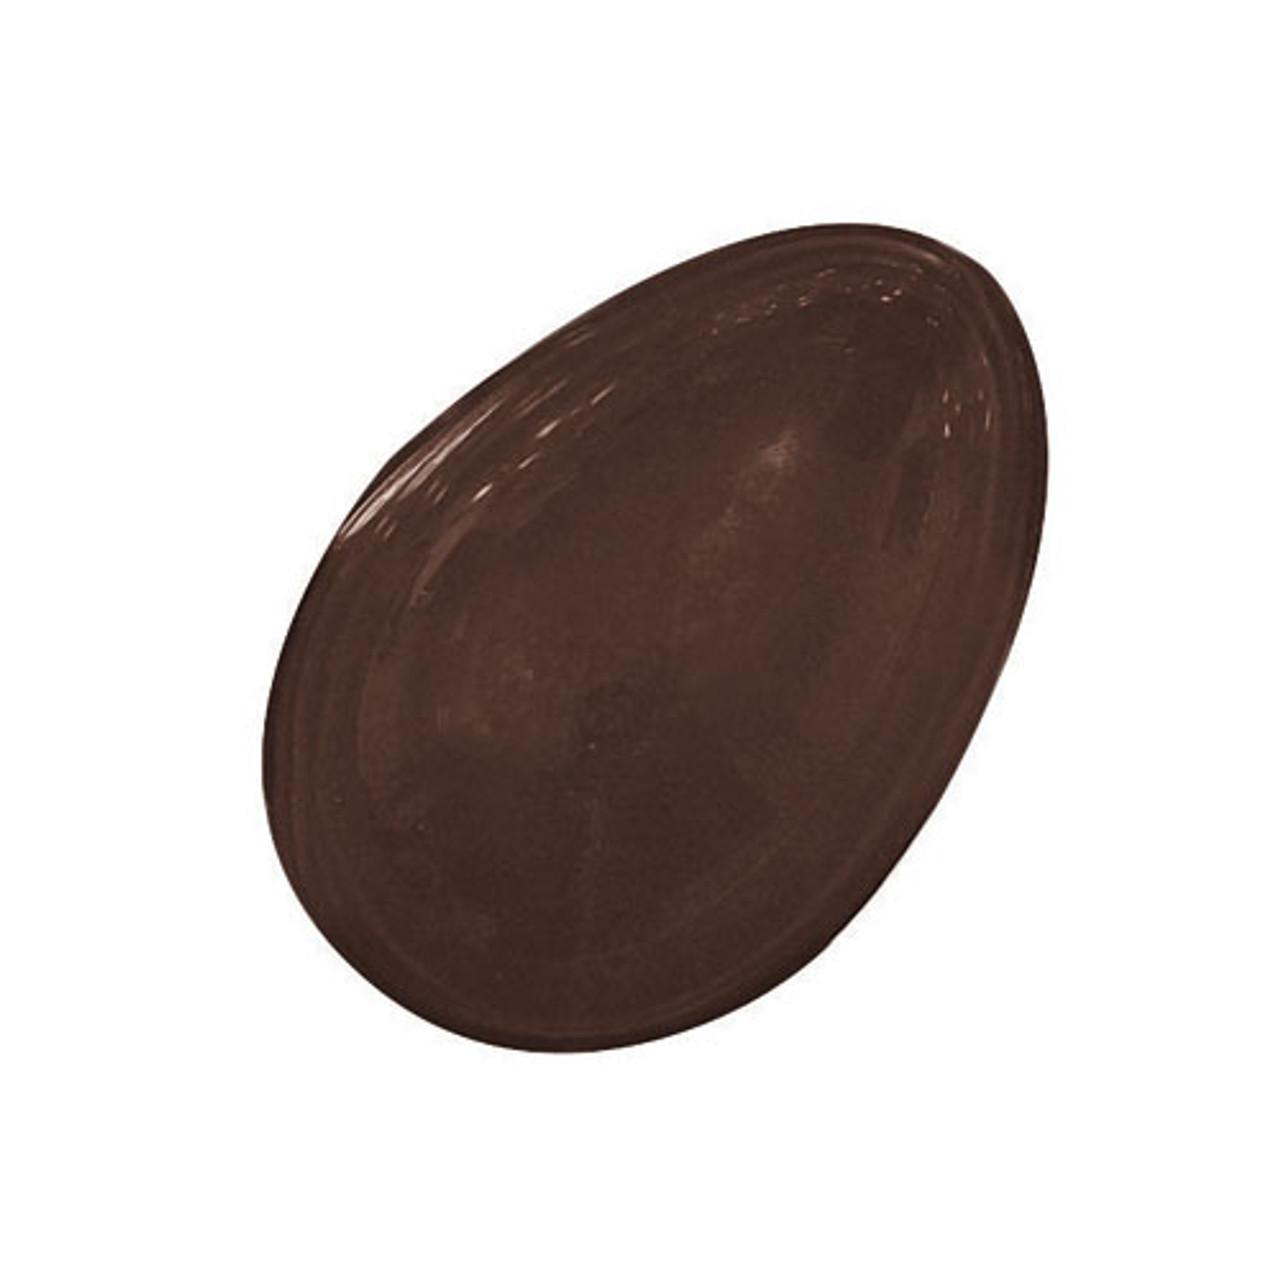 "Chocolate Mold, Egg, L 8 5/8"" X W 6 1/4"" X H 3 1/8"